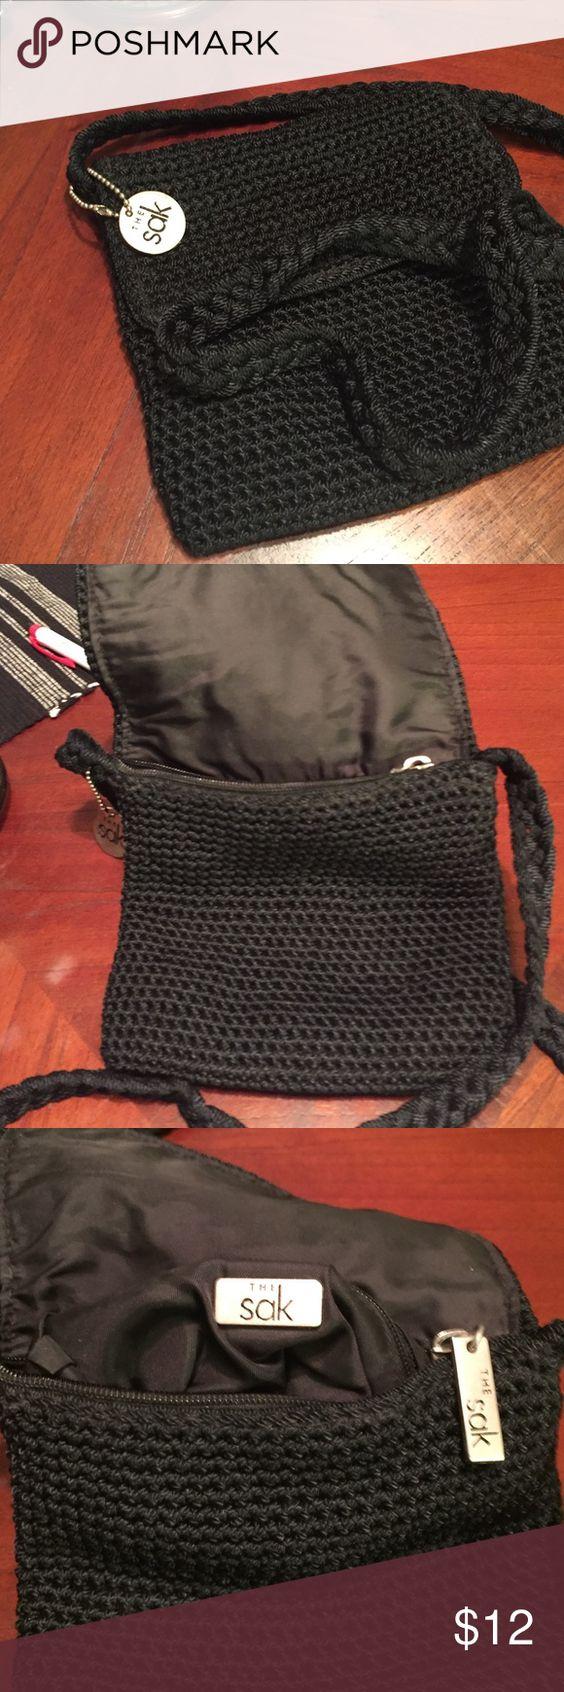 "The Sak cross shoulder purse Really cute black cross body Sak purse. 7"" height, 7"" width, strap 12"" long. The Sak Bags Crossbody Bags"